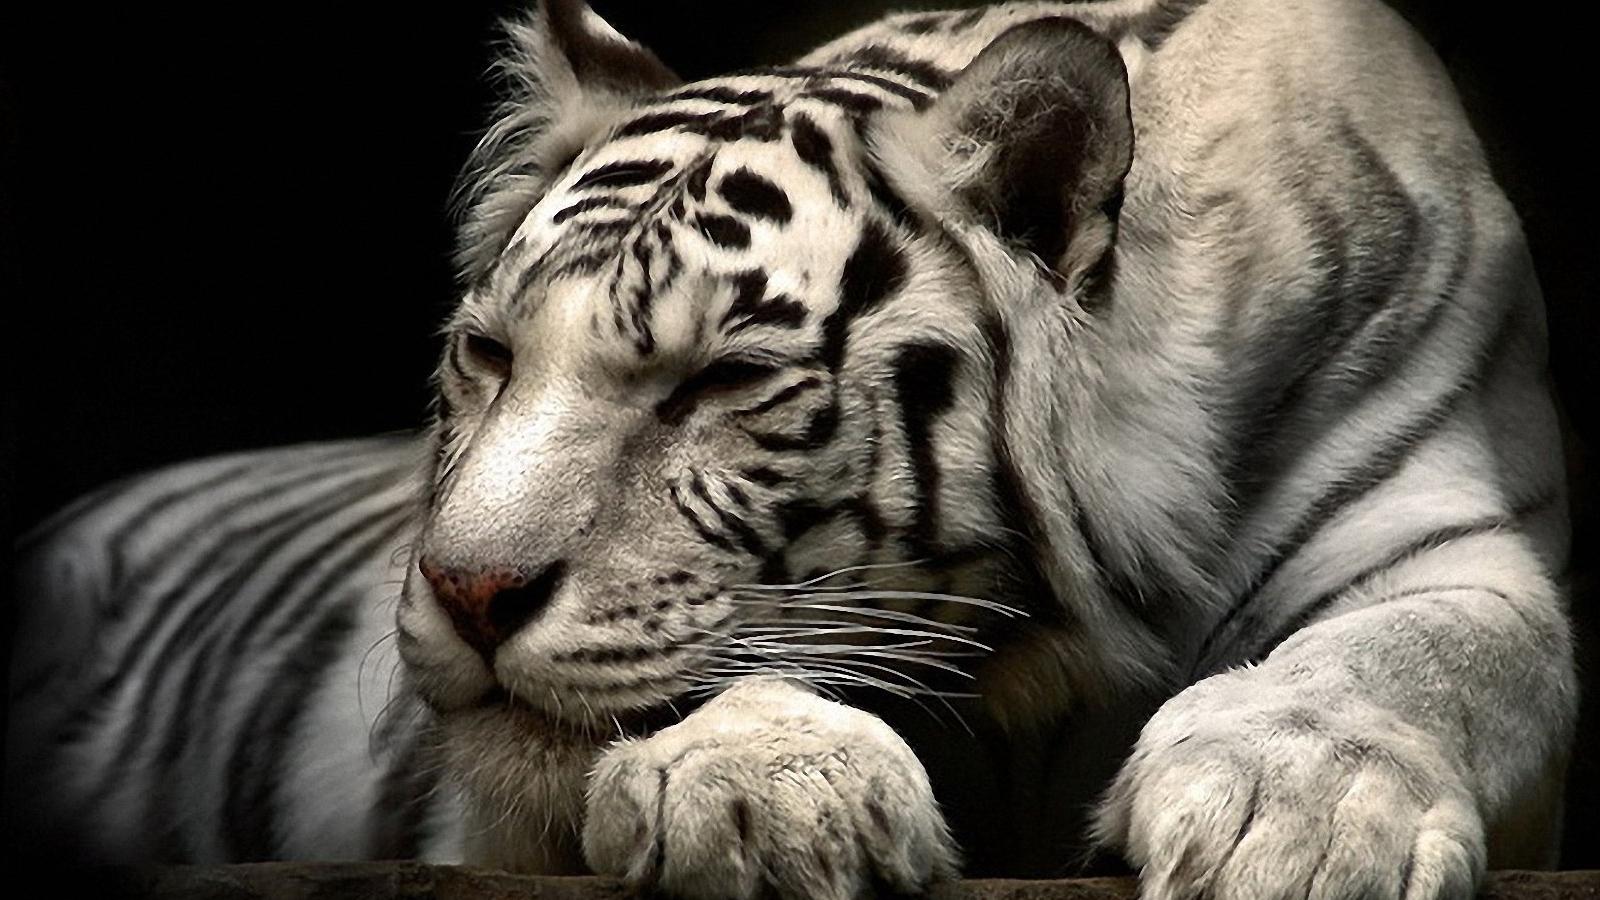 white tiger wallpaper hd - wallpapersafari